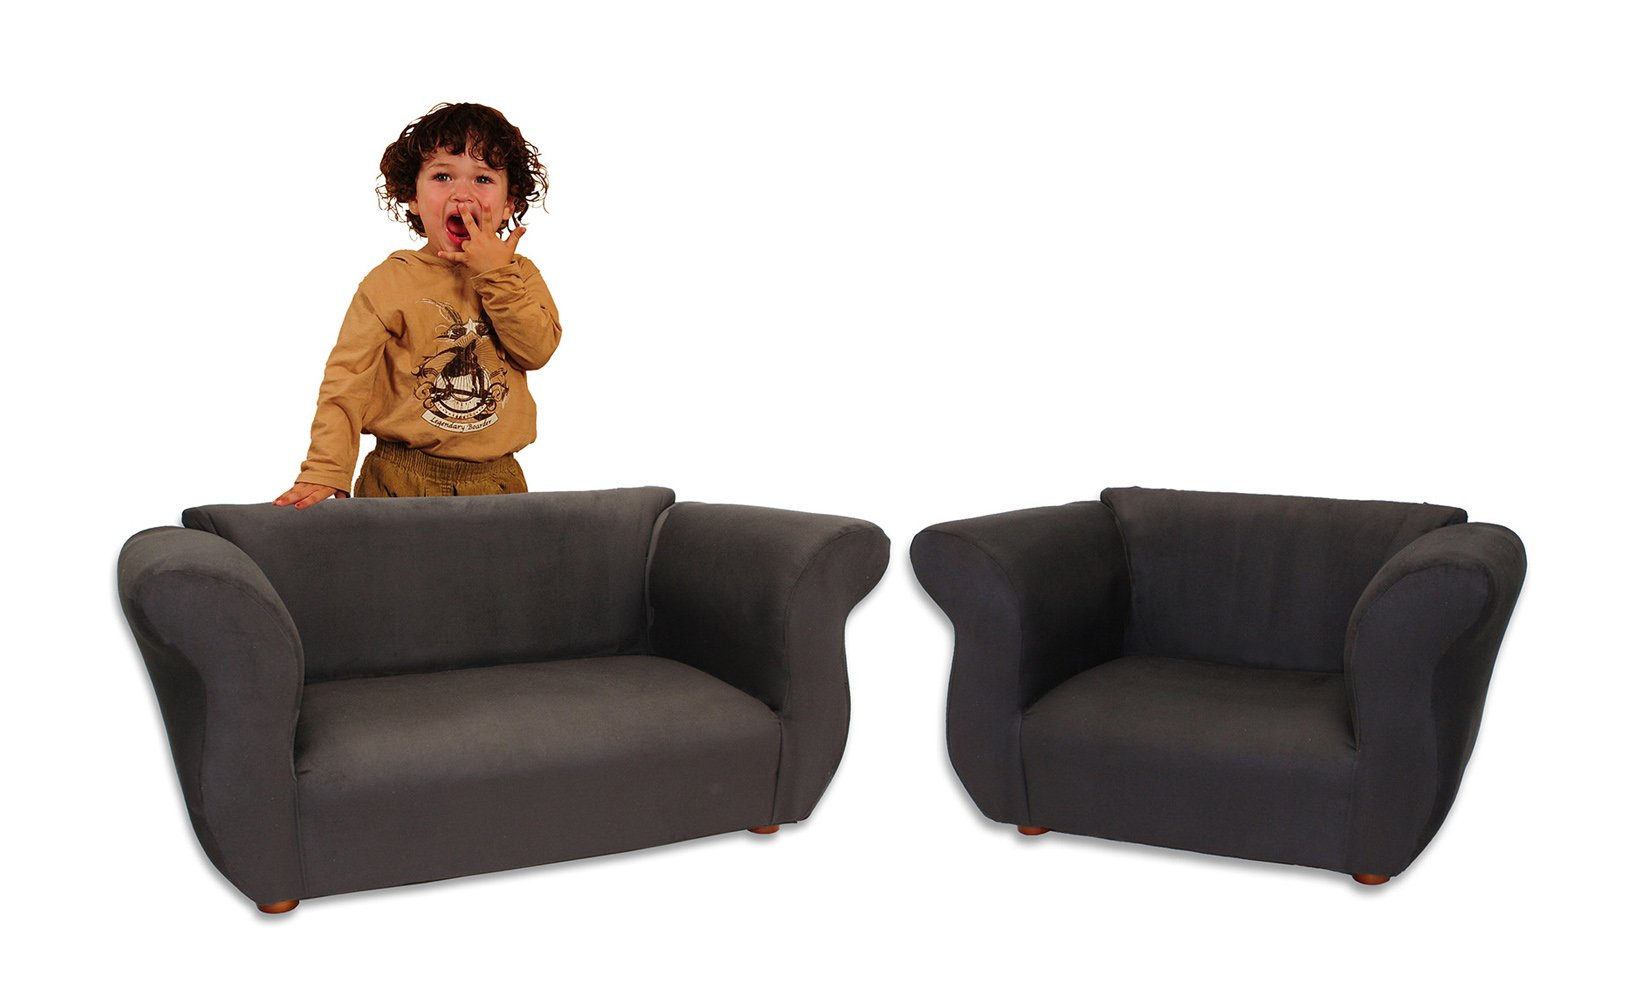 KEET Sofa and Chair Fancy Kid's Set, Black